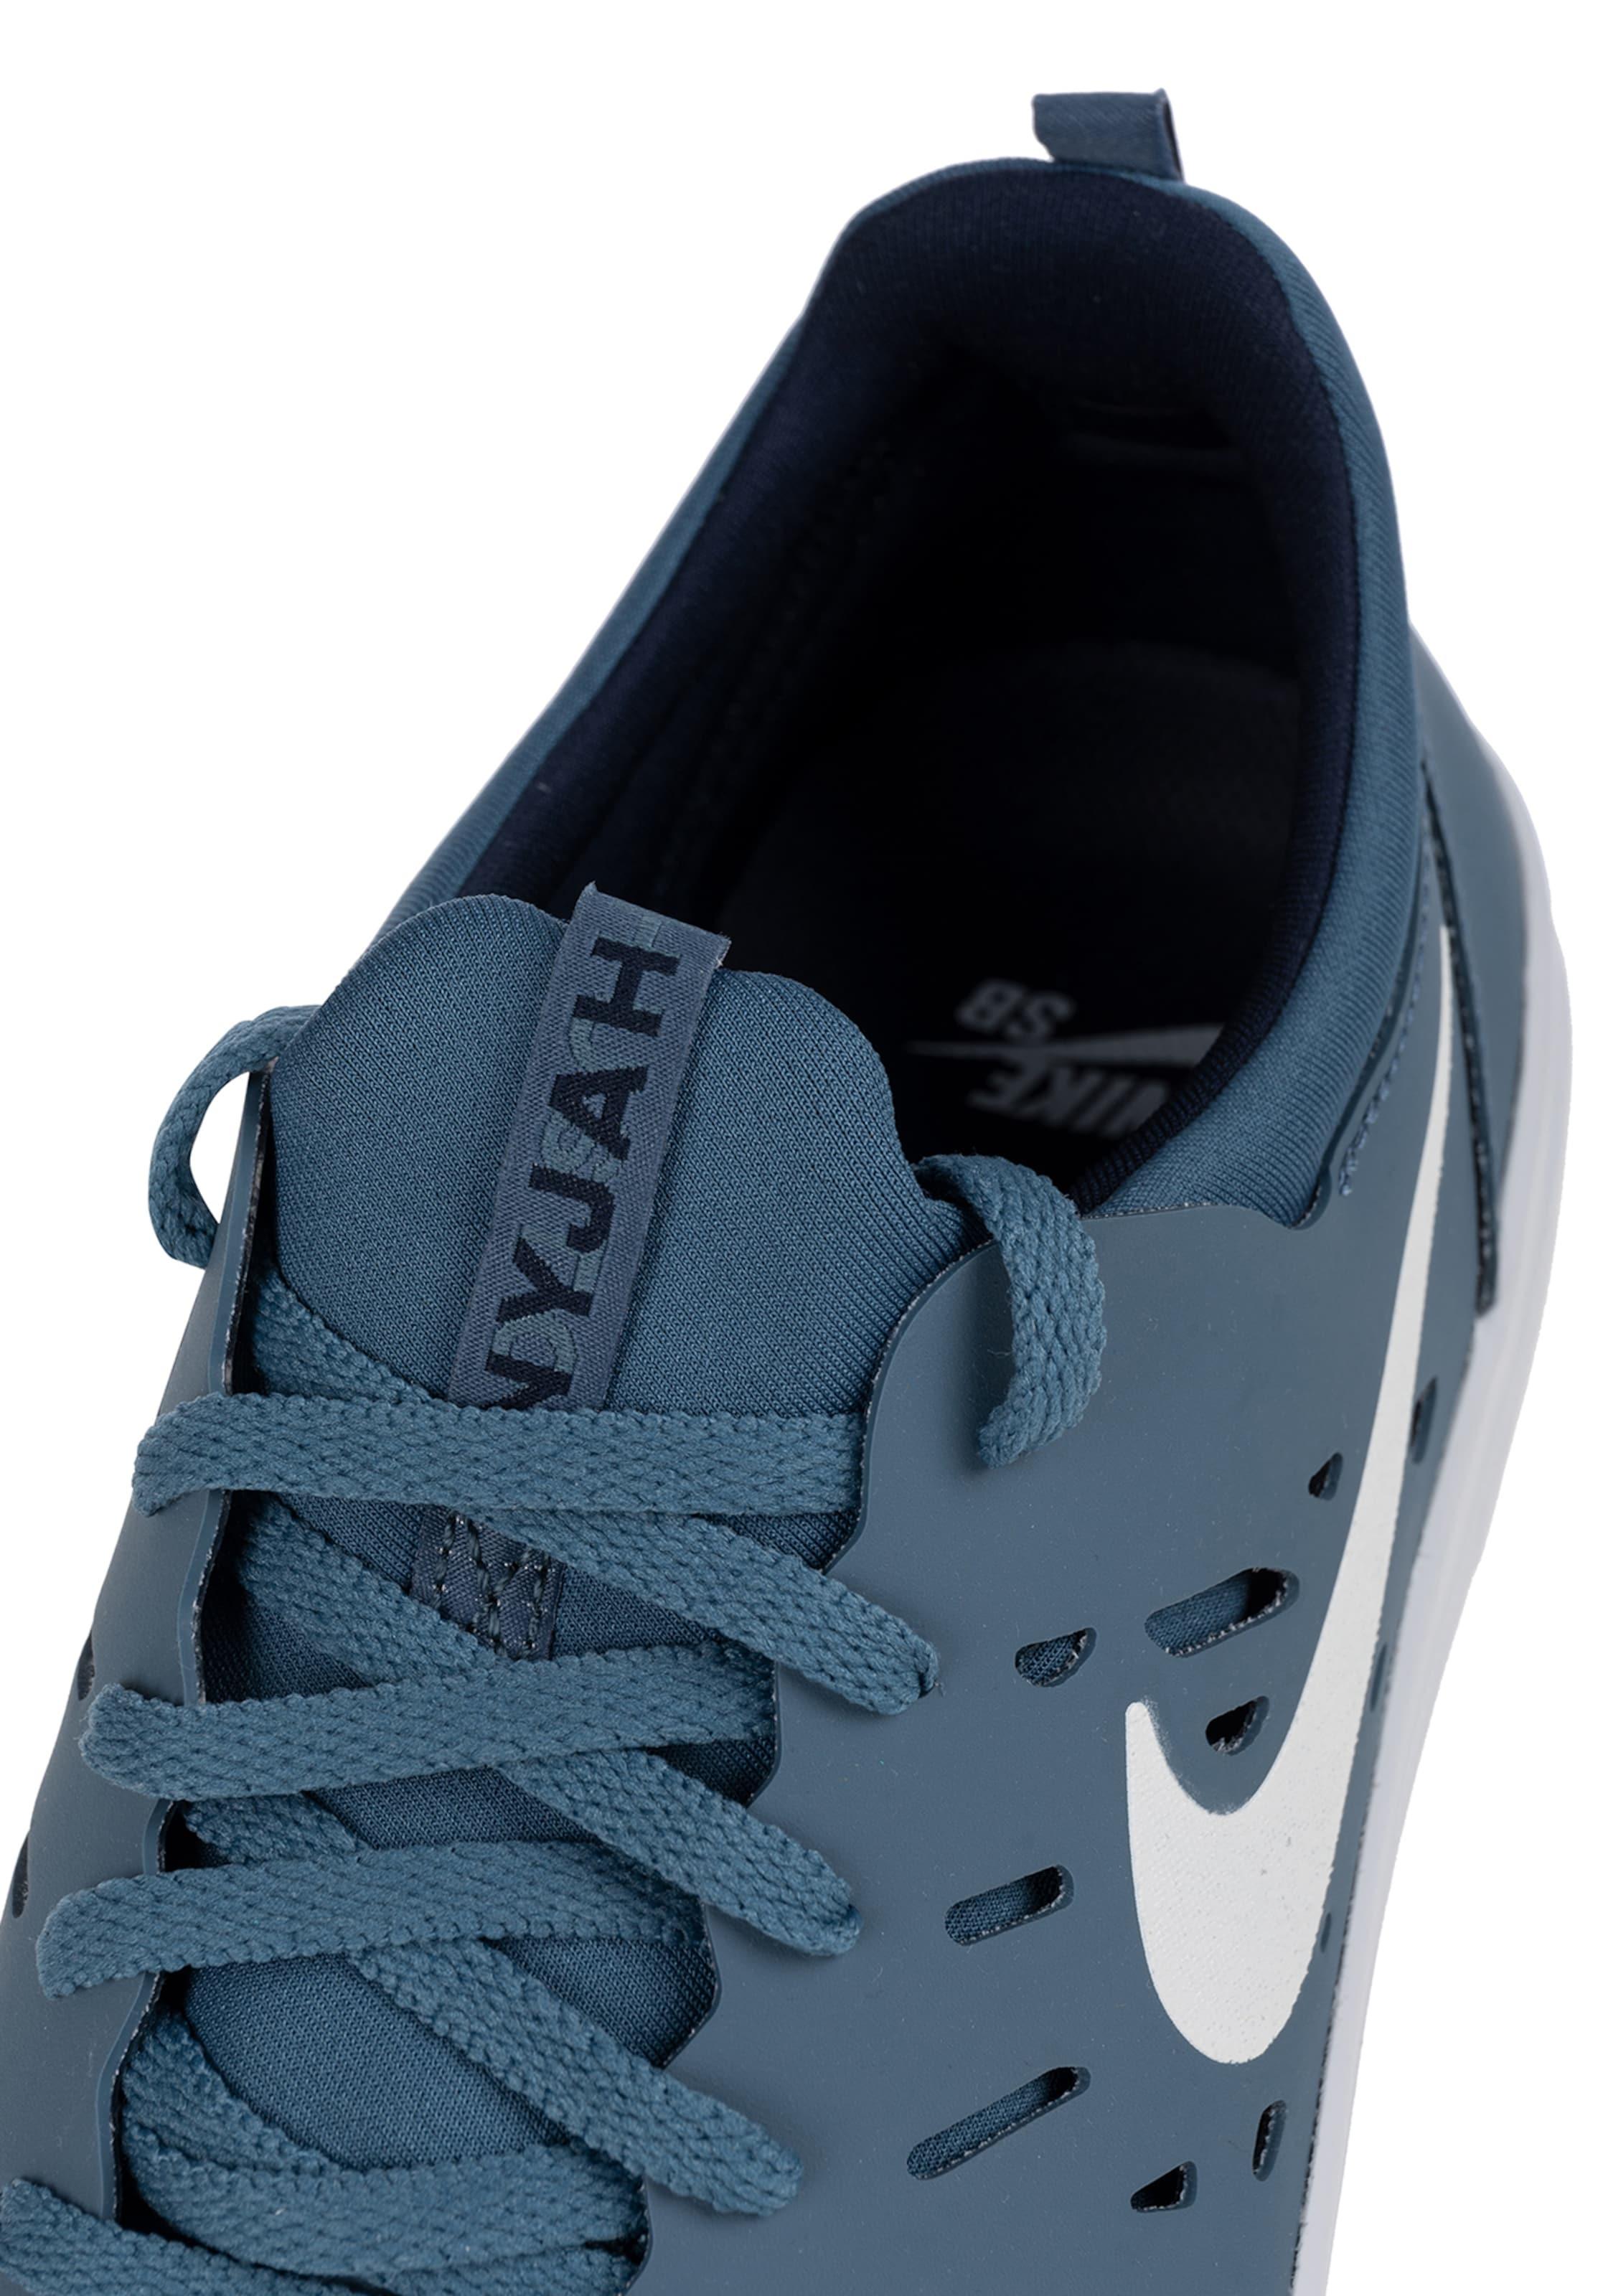 Sb In Nike 'nyjah TaubenblauWeiß Free' Sneaker Ibgym6f7Yv